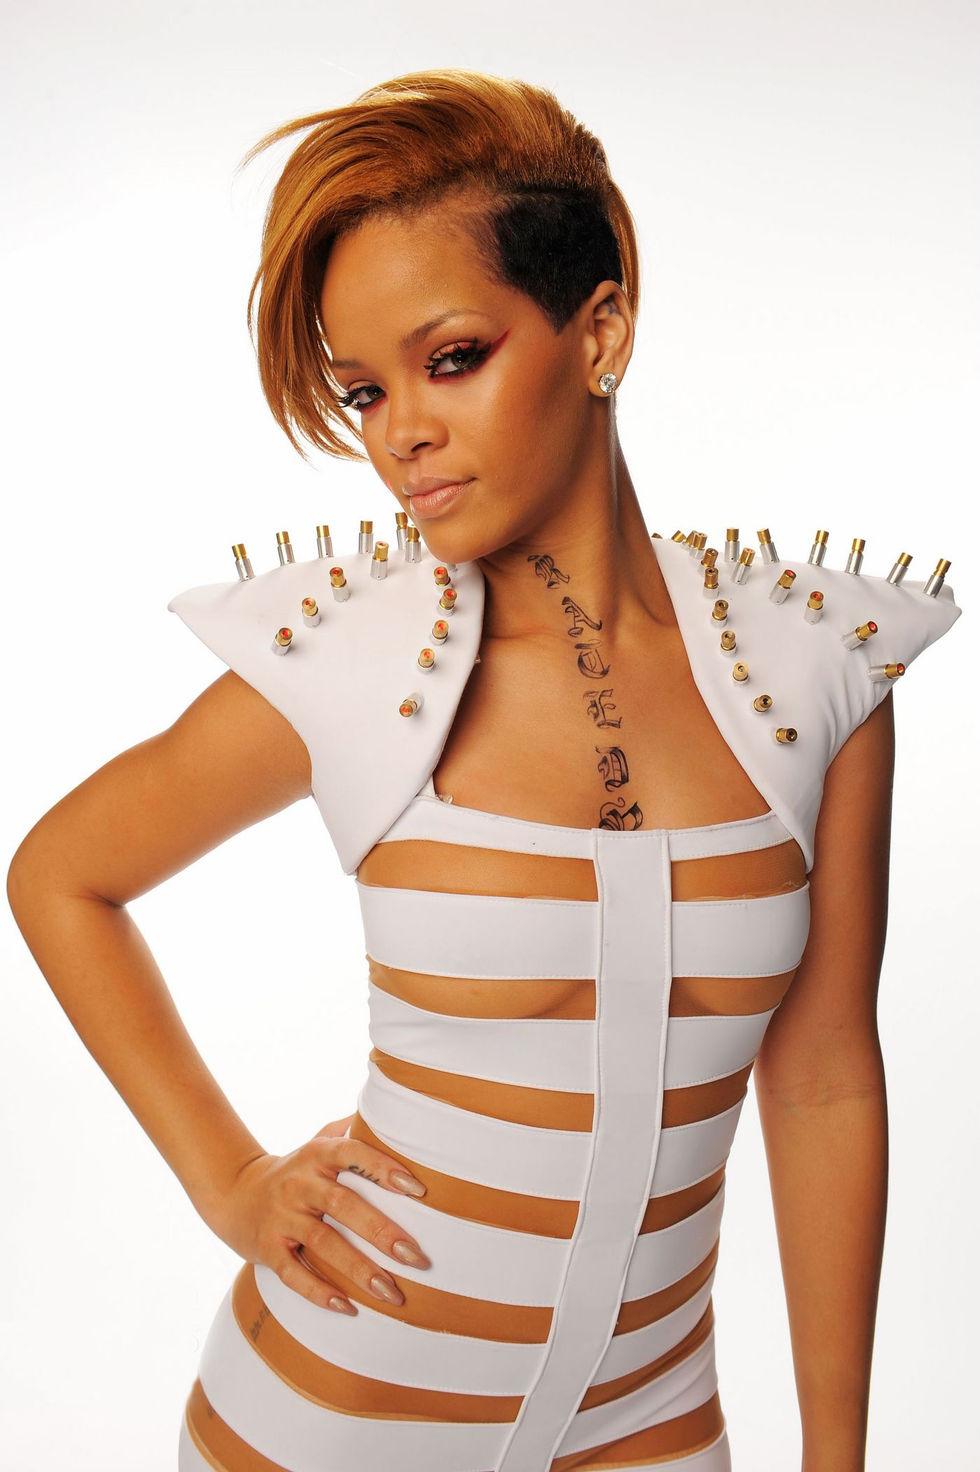 rihanna-2009-american-music-awards-photoshoot-01